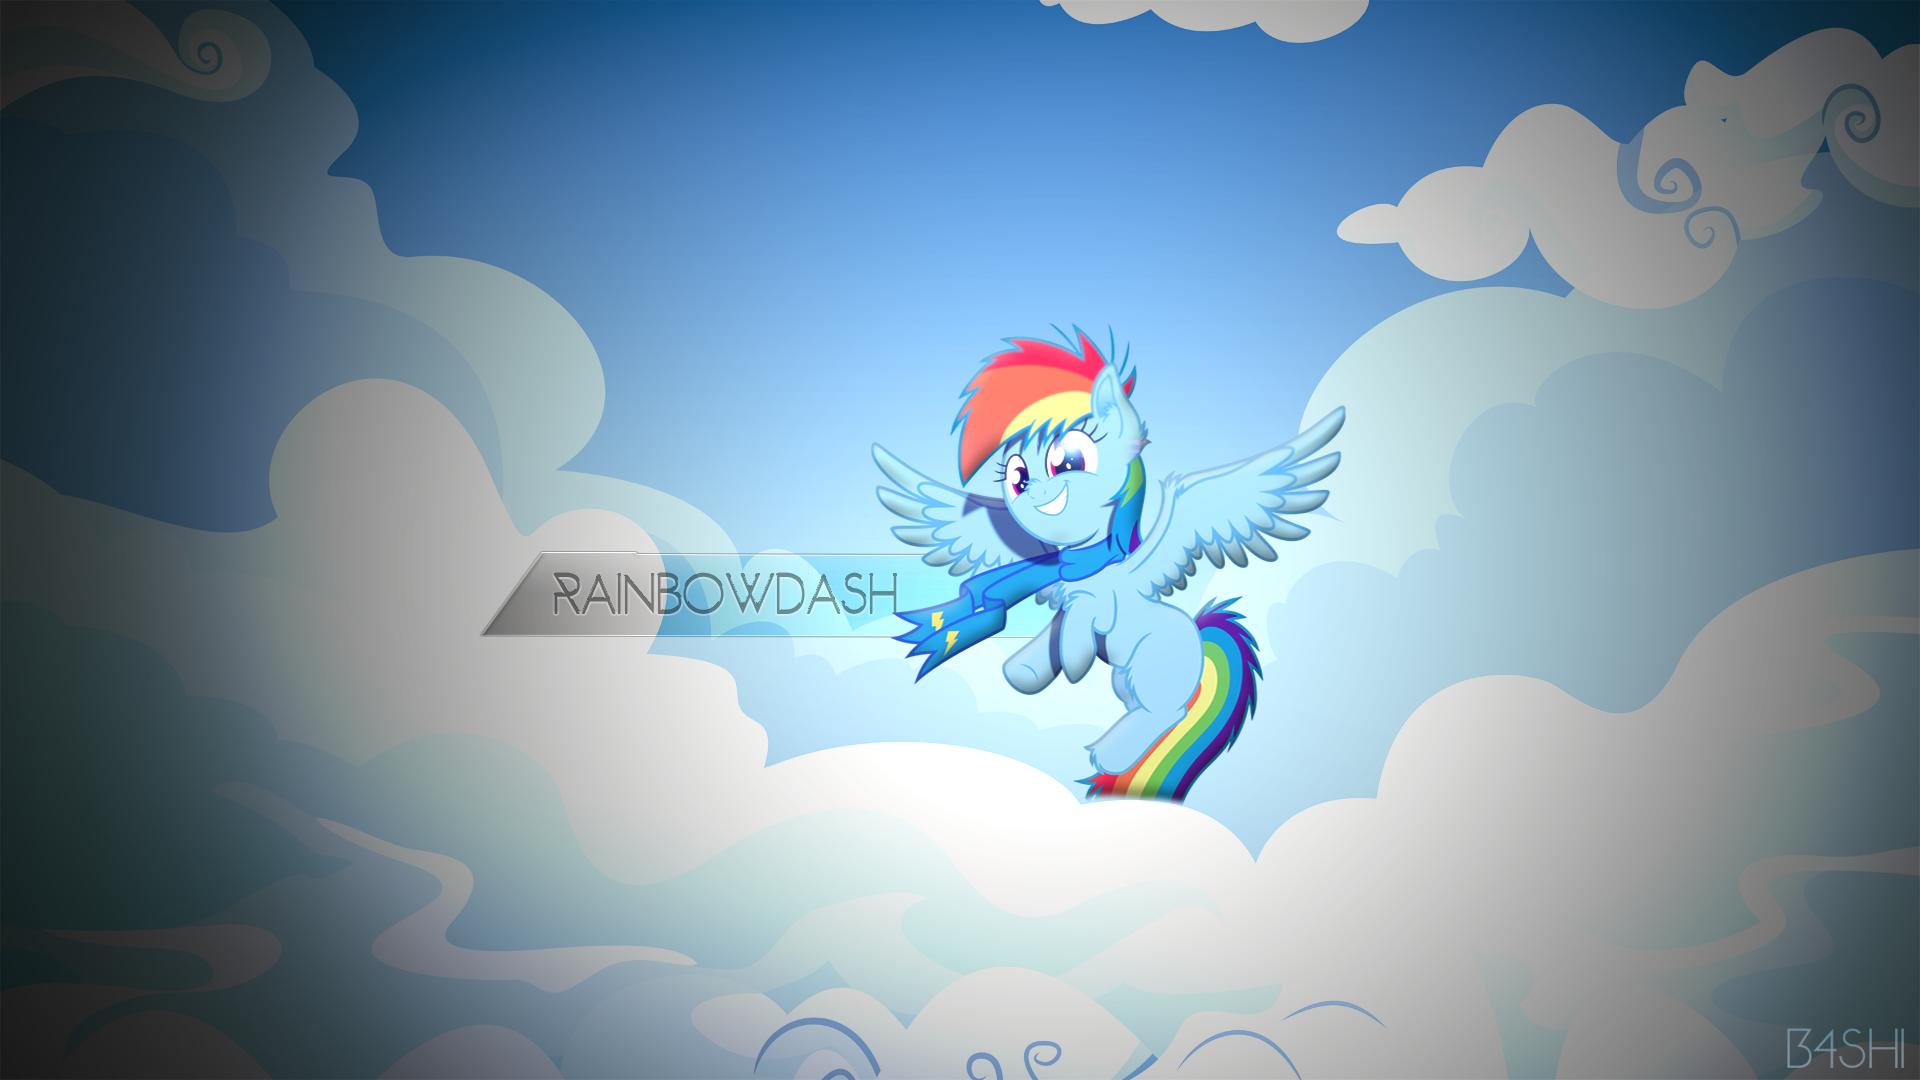 Rainbowdash - Wallpaper [1920x1080] by GoblinEngineer, MacTavish1996 and Rainbowb4sh